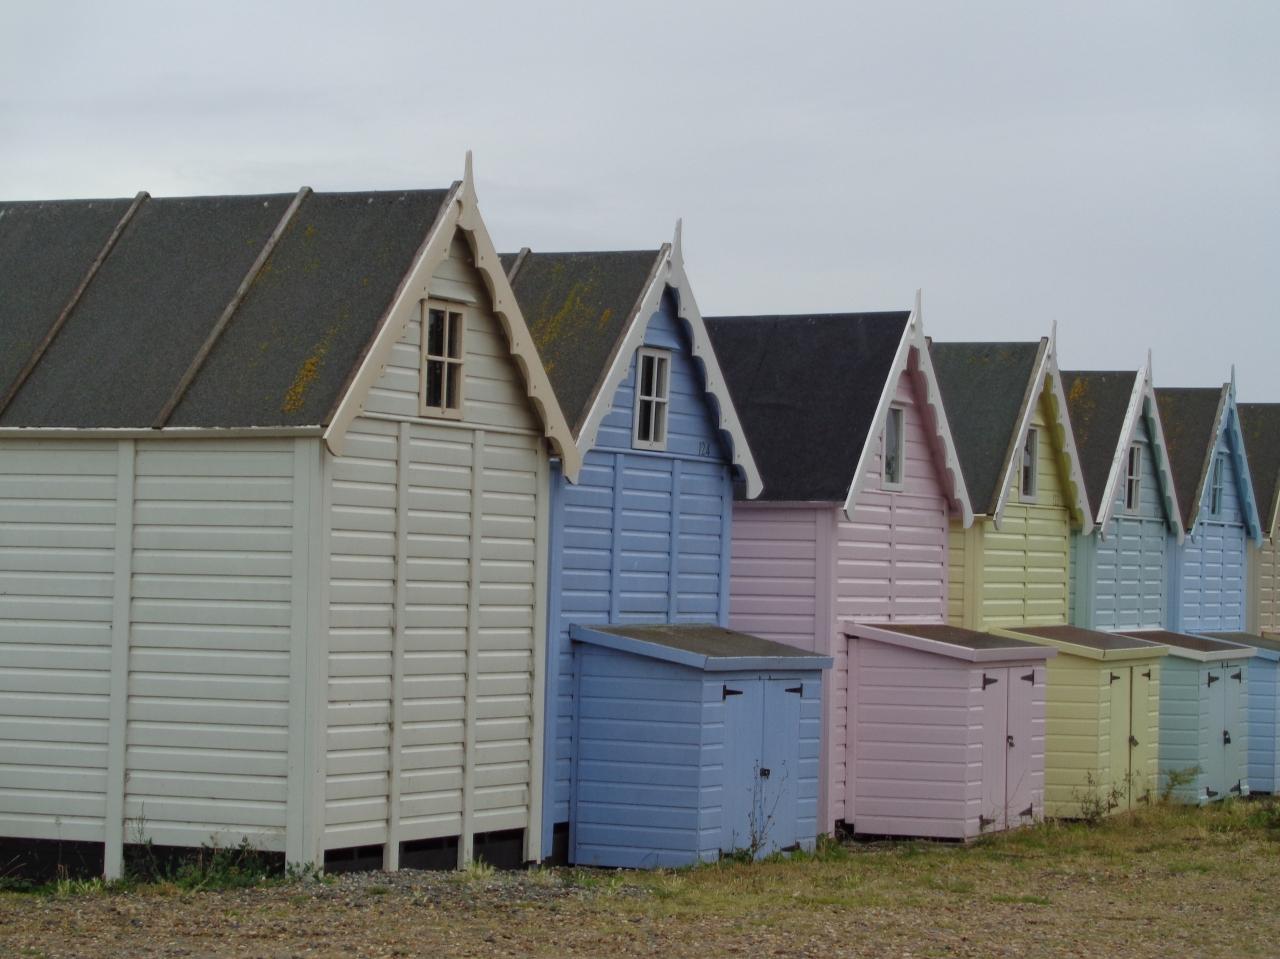 Beach huts, Mersea Island, Essex